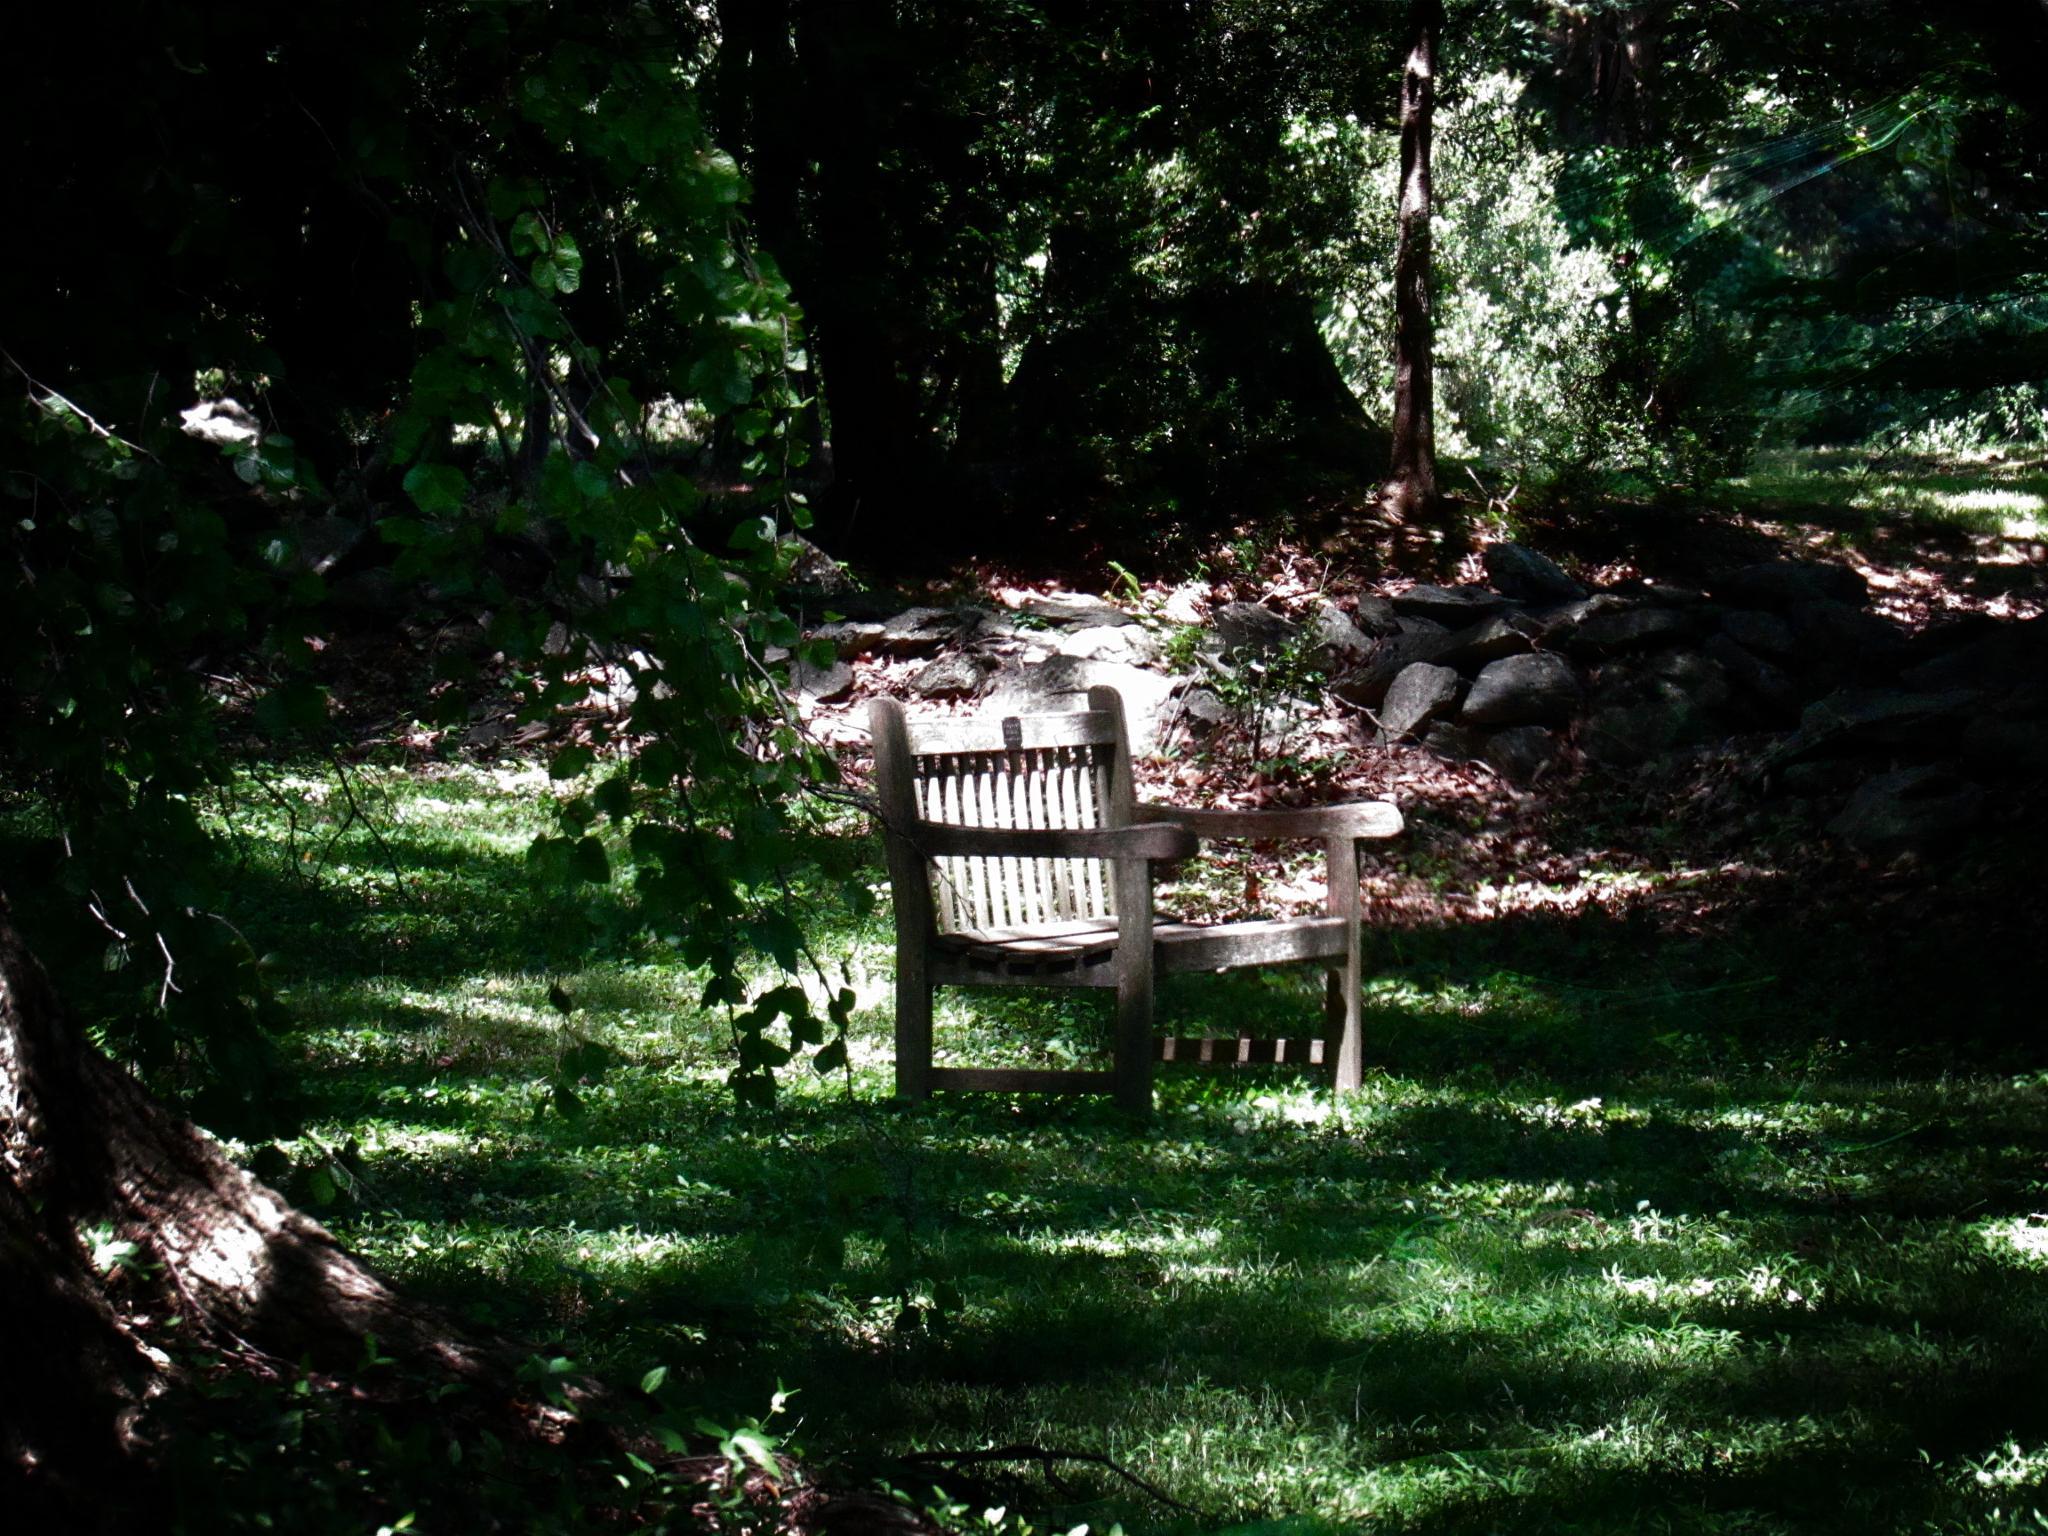 My Peaceful Place by Catherine Wegener